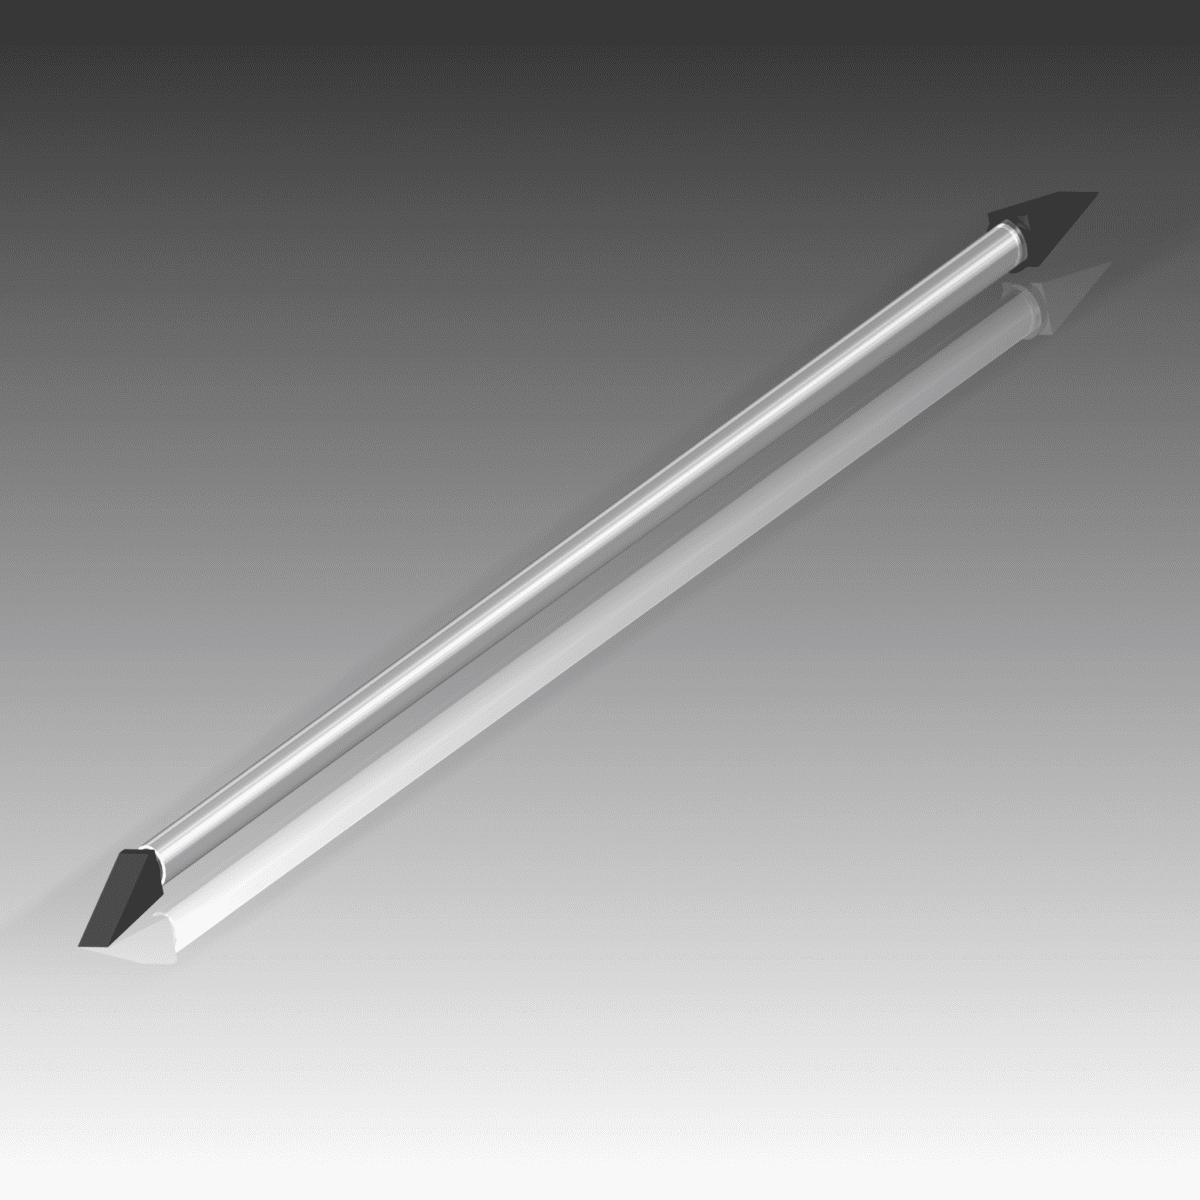 Pince ou canne à purger tube aluminium 1,7m – 4 outils